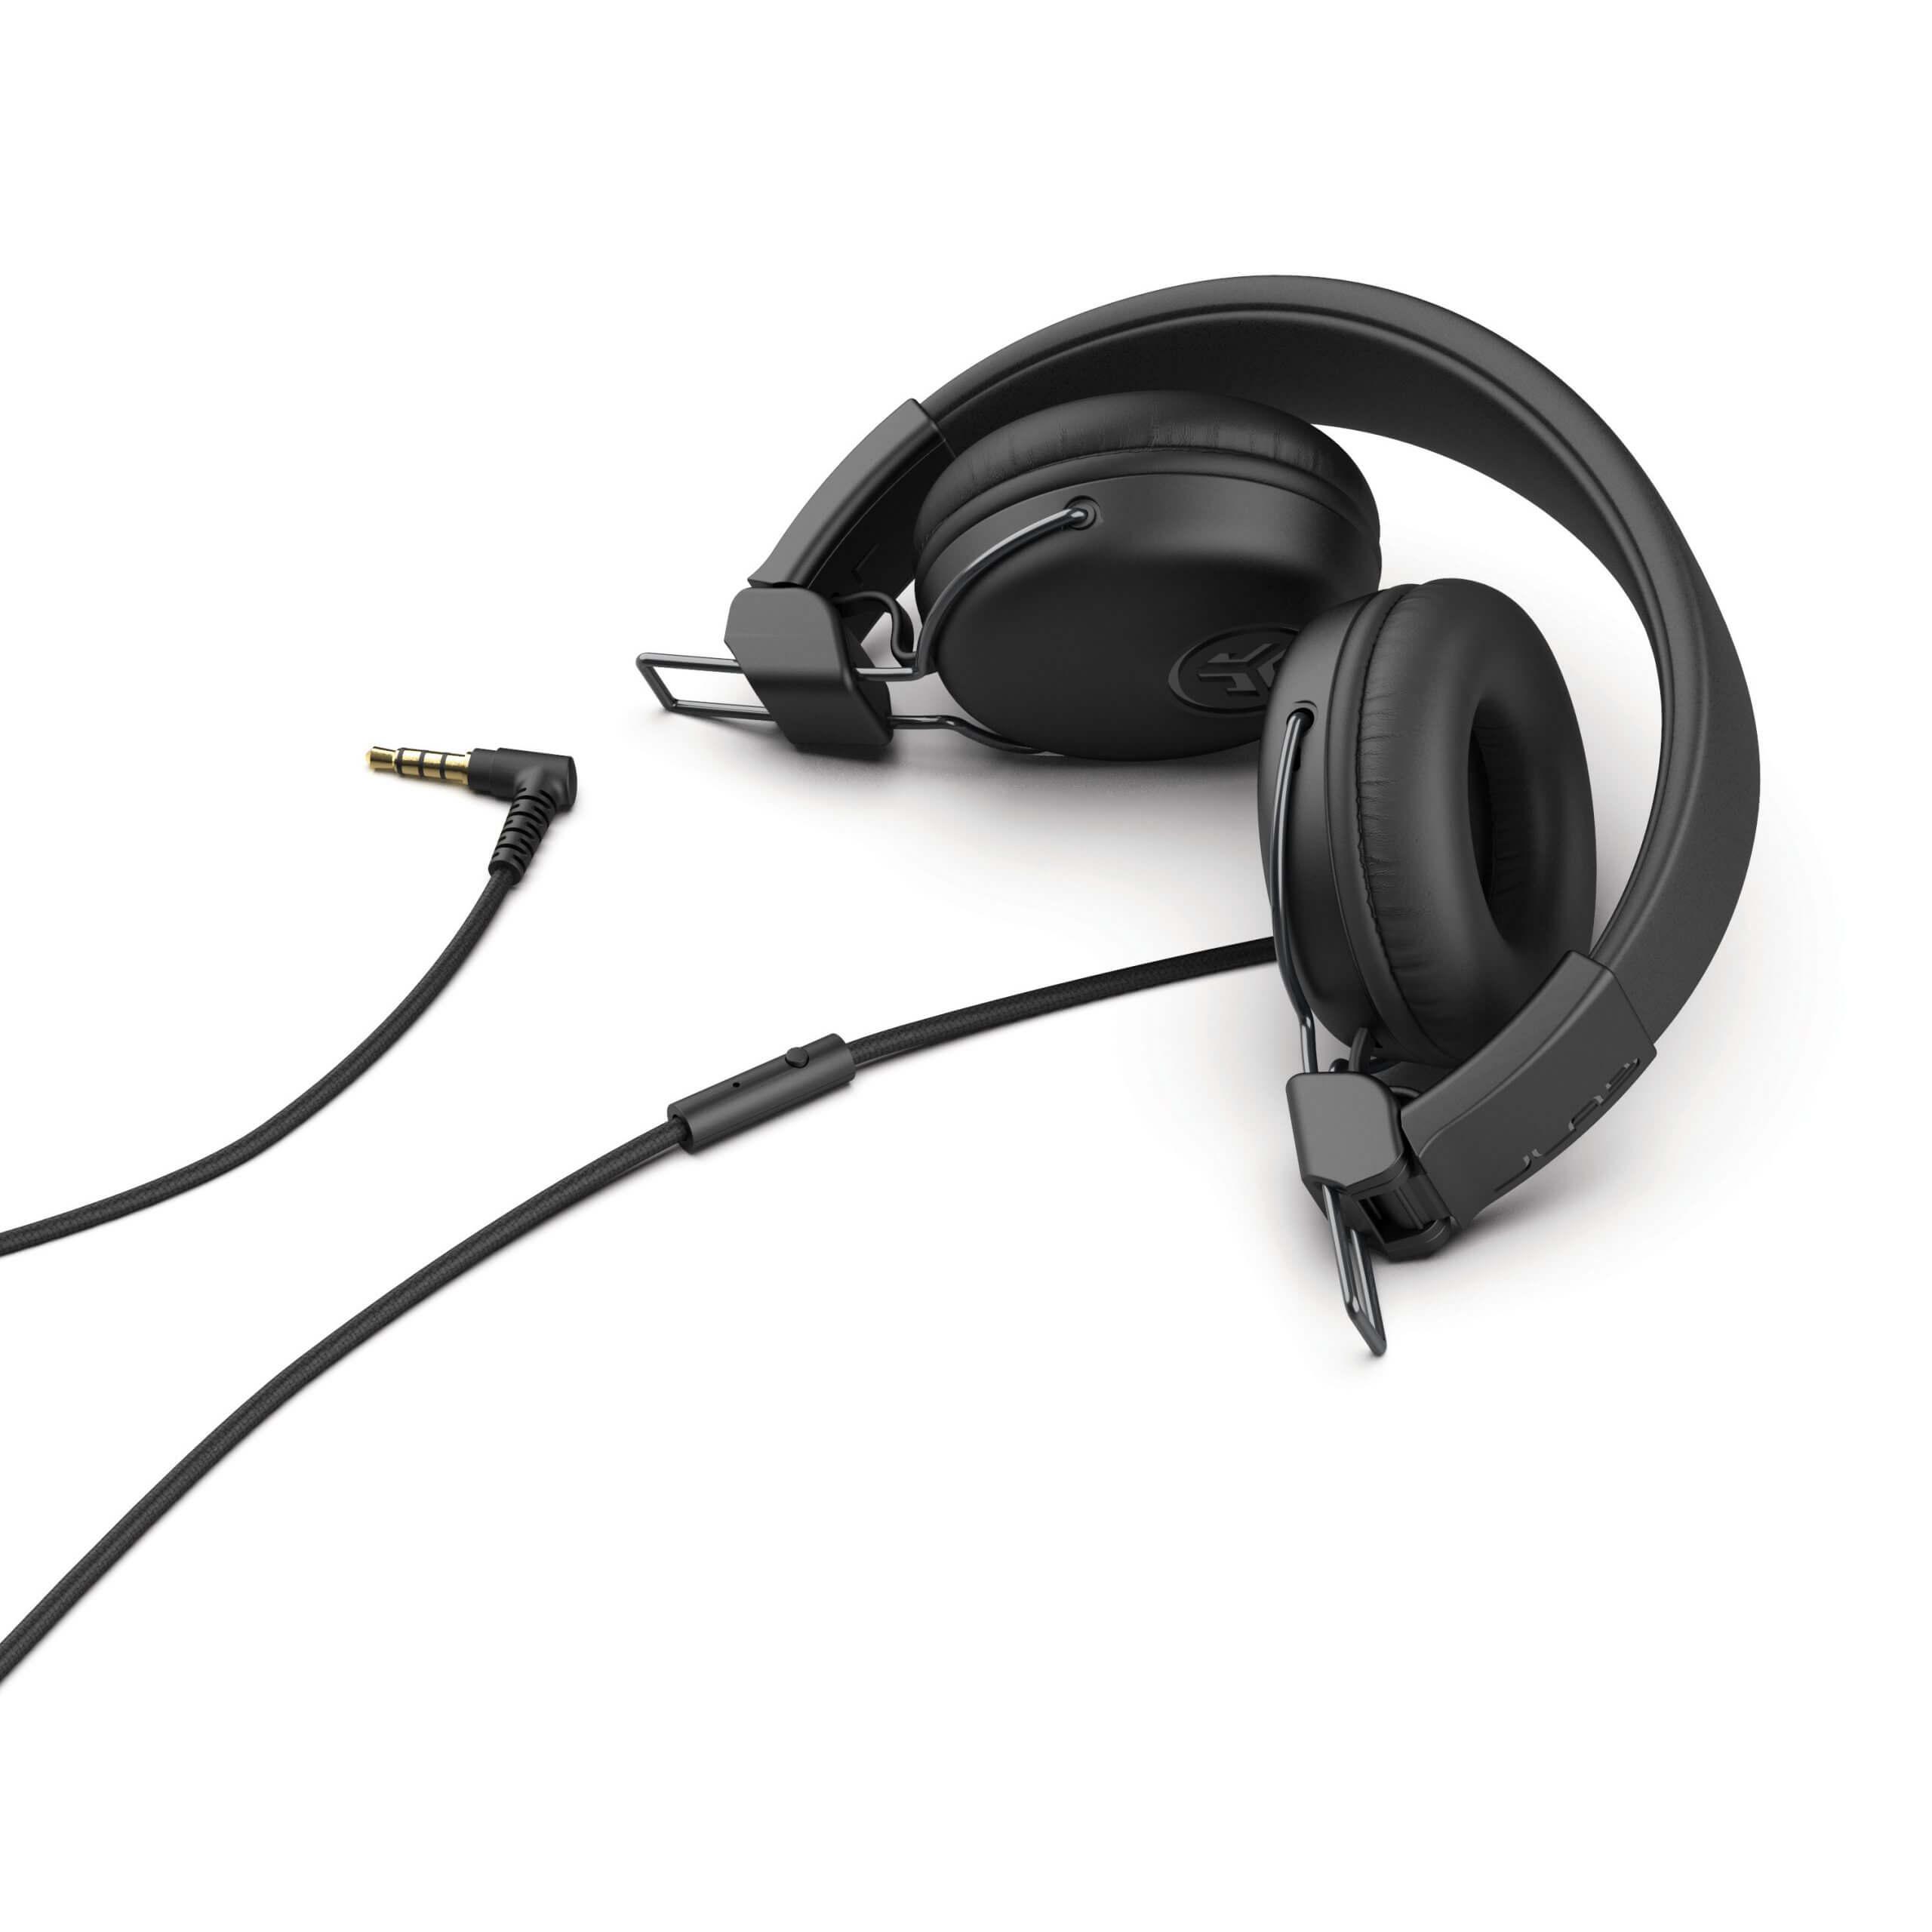 Cheap headphones